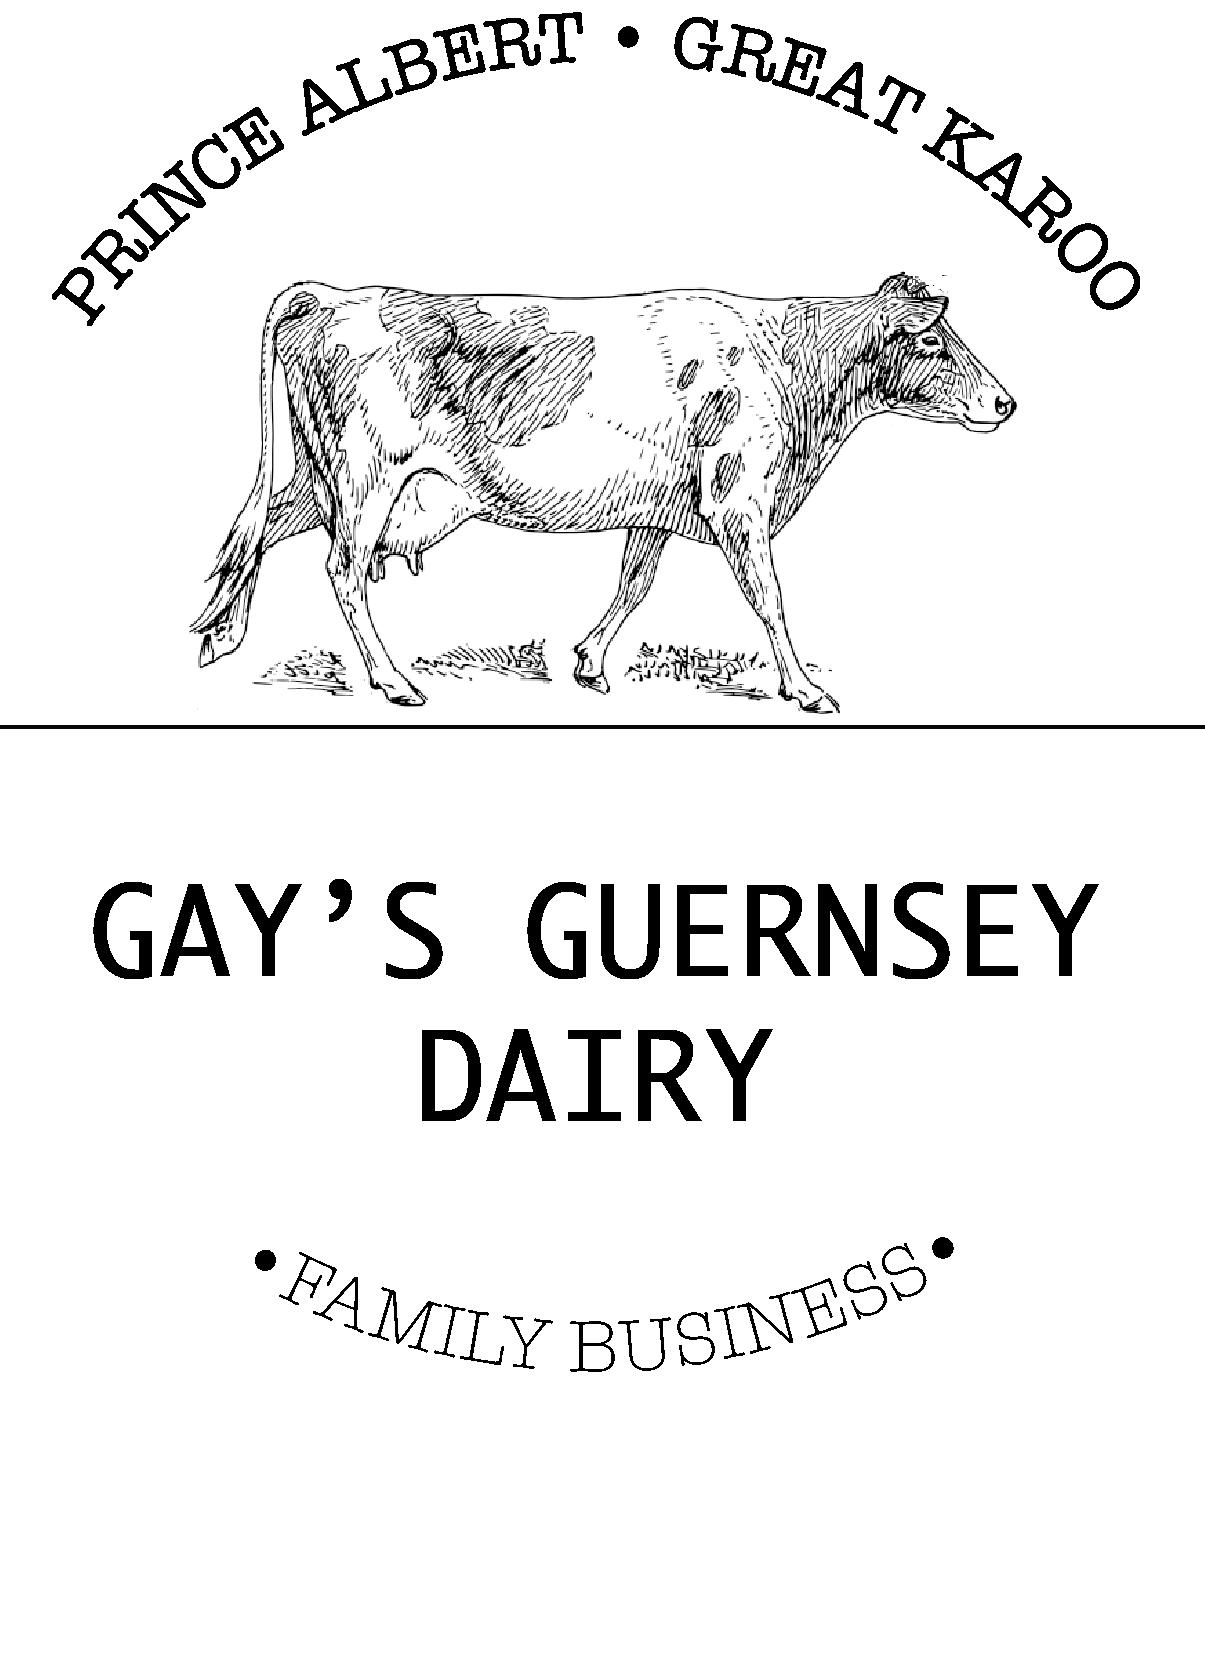 Gay s guernsey dairy. Clipart milk melk